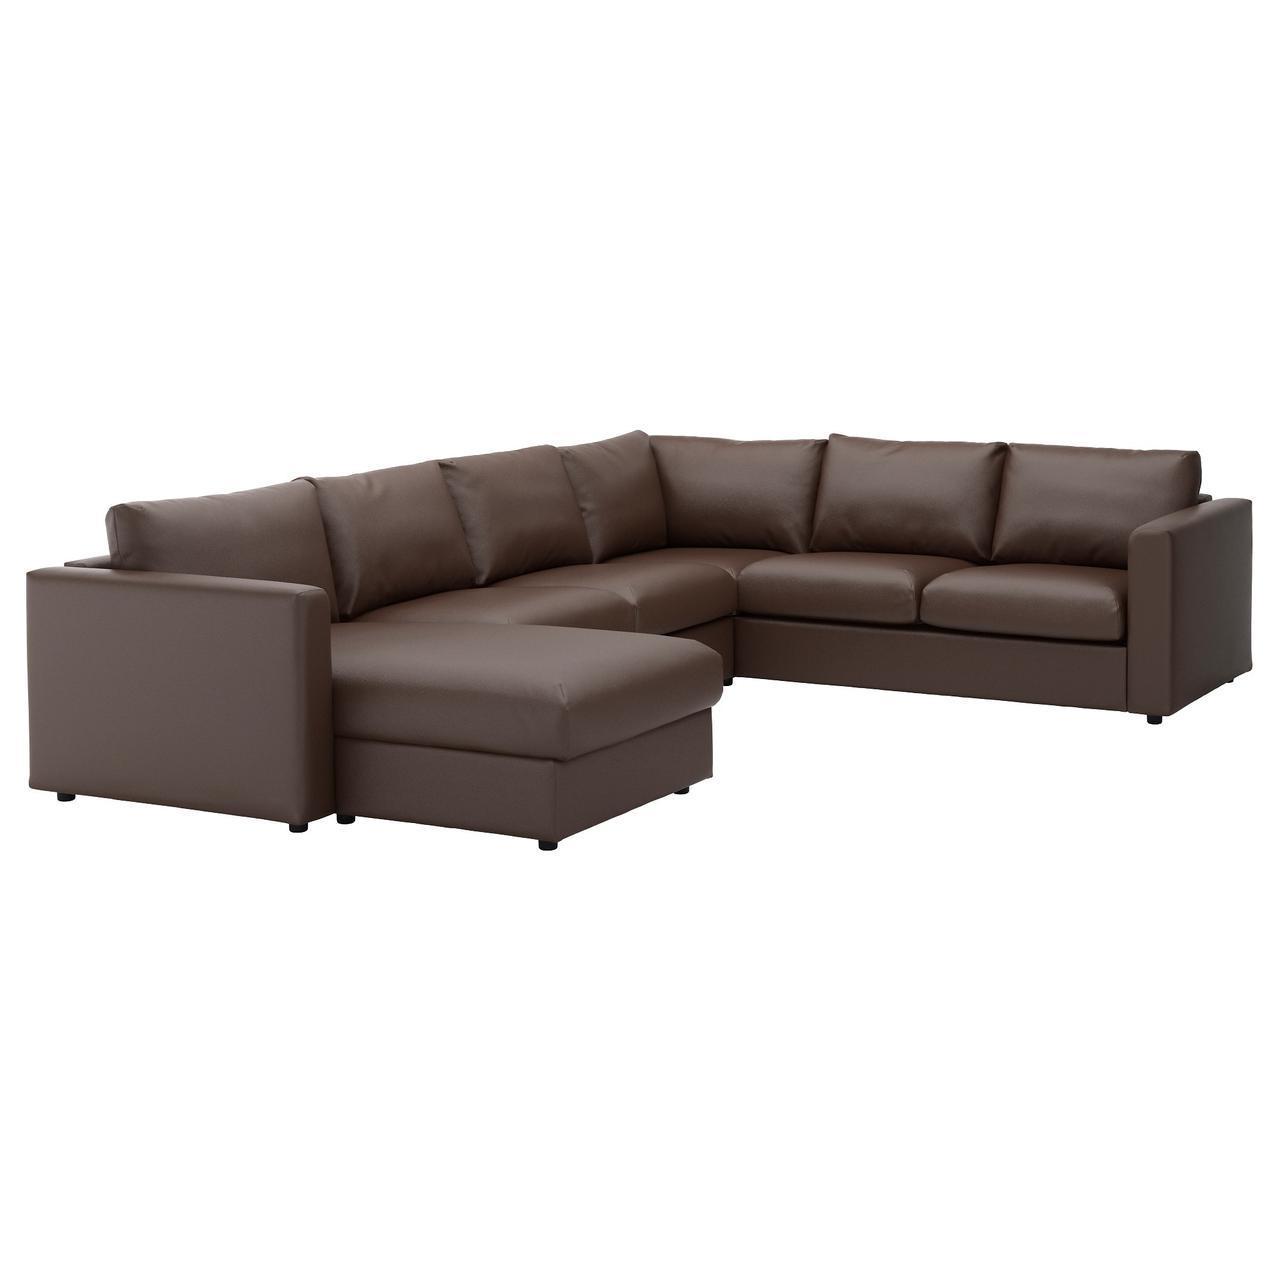 ✅ IKEA VIMLE (792.114.10) Угловой диван, 5-местный, с шезлонгом, Farsta темно-синий